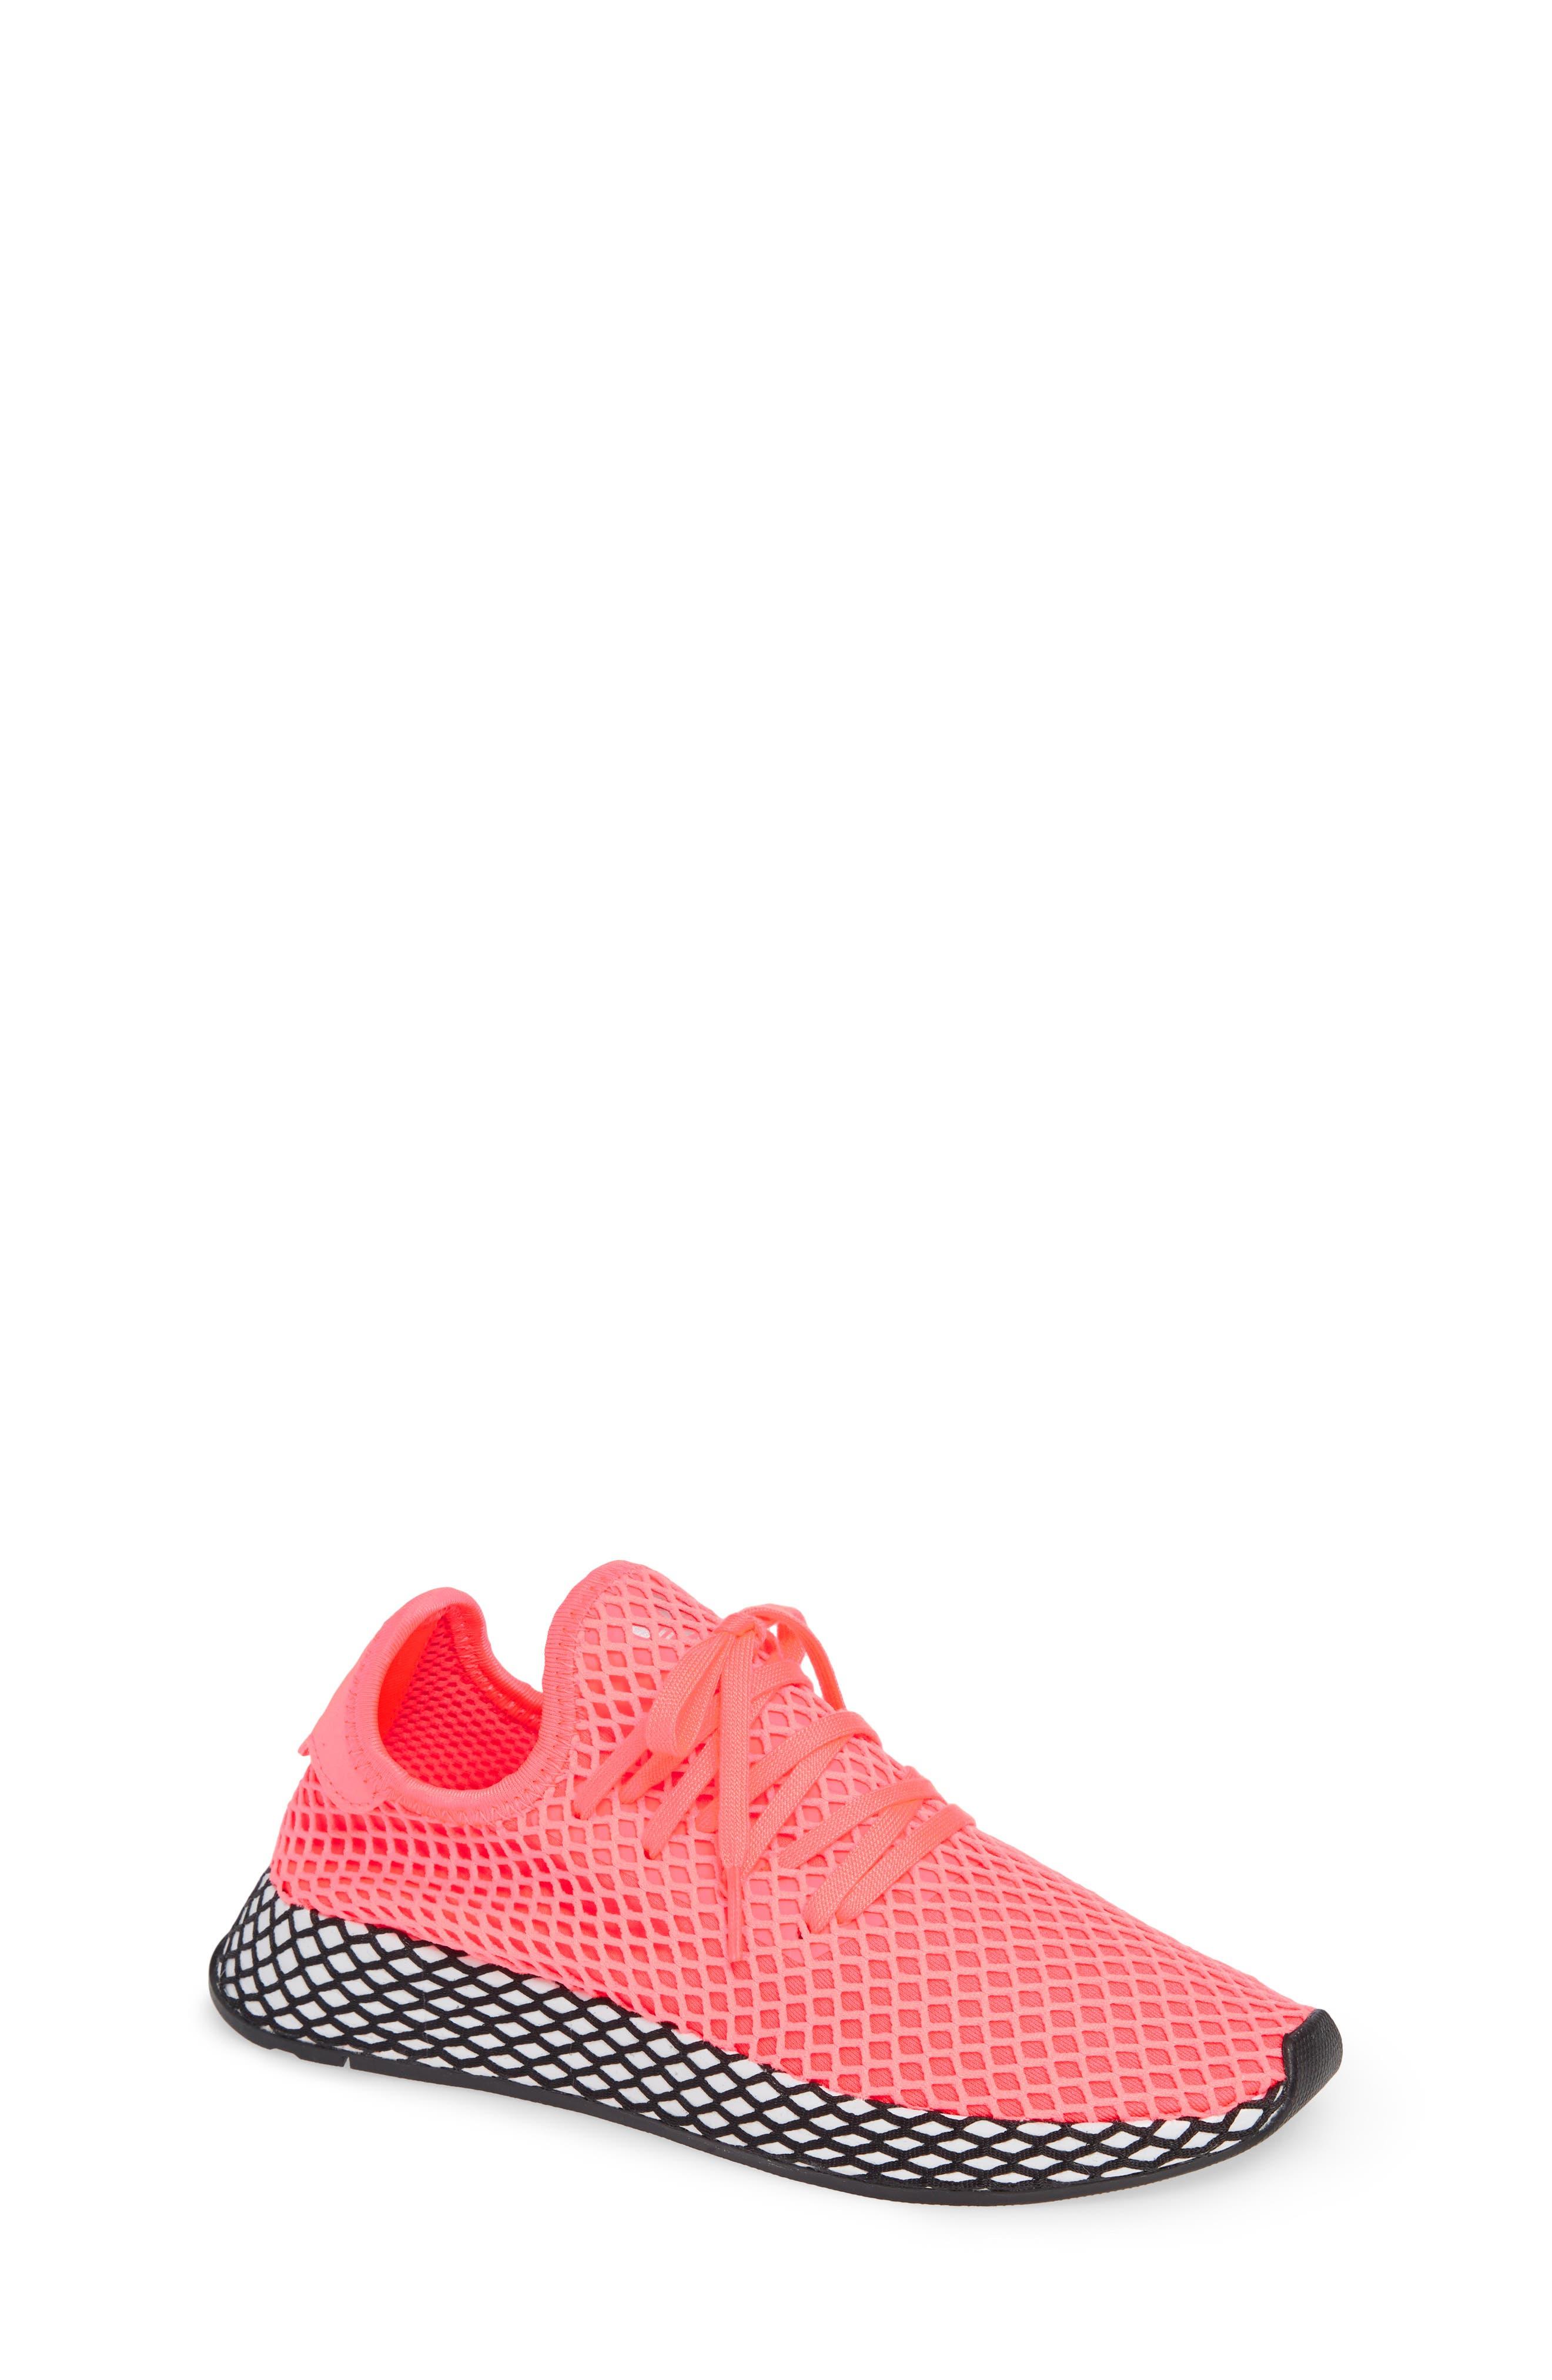 Deerupt Runner Sneaker,                             Main thumbnail 1, color,                             TURBO/ TURBO/ BLACK